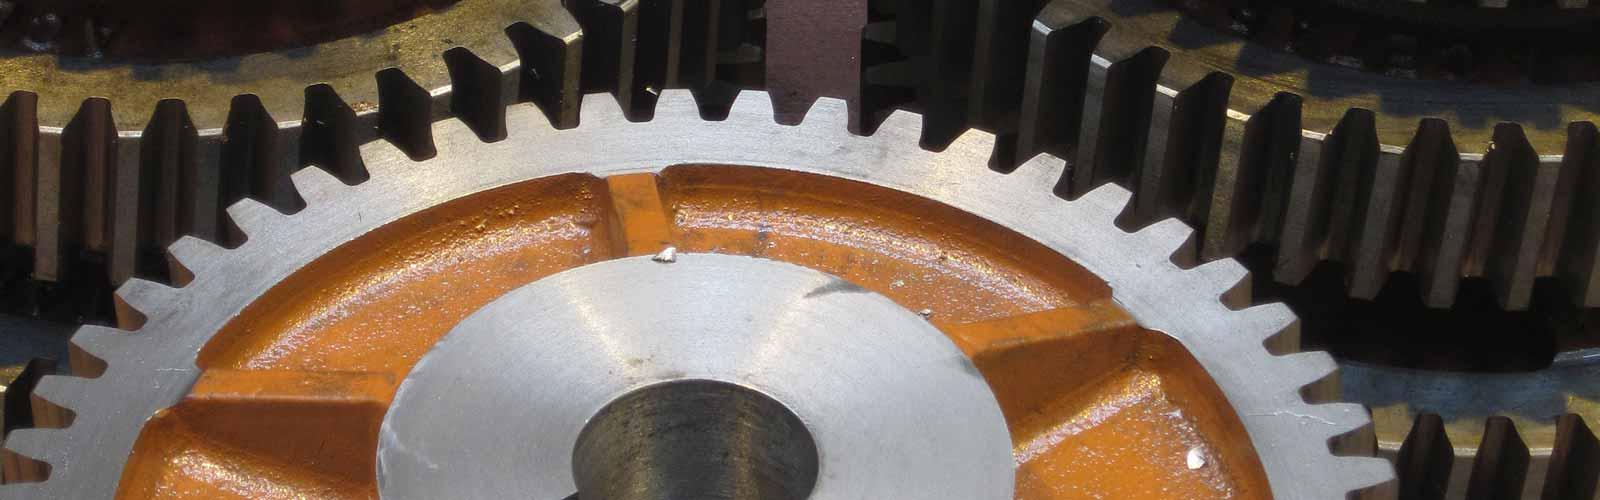 Gear cutting, yorkshire, allan-Green-Acetarc-gears